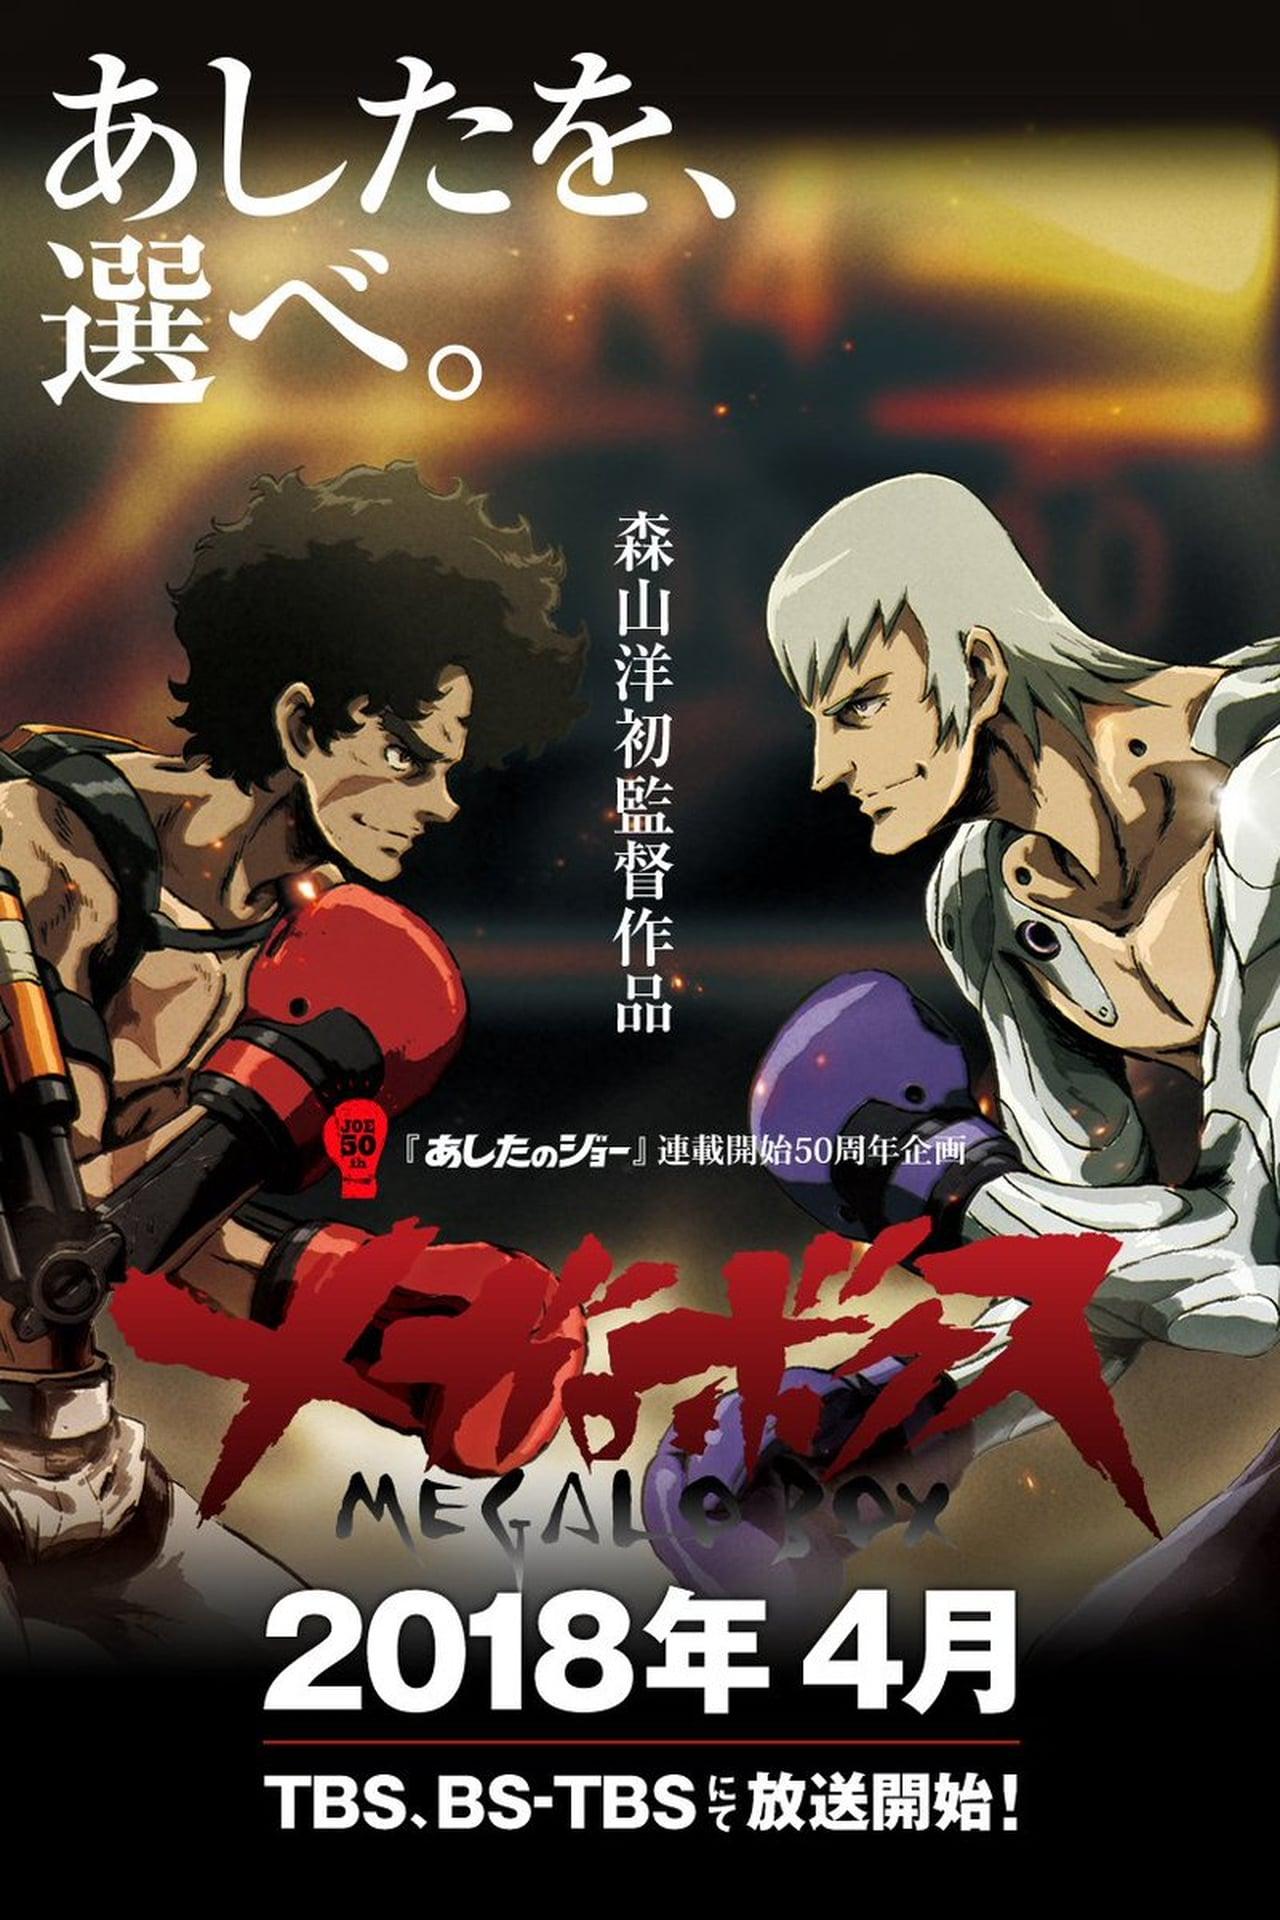 Watch Megalobox Season 1 Online